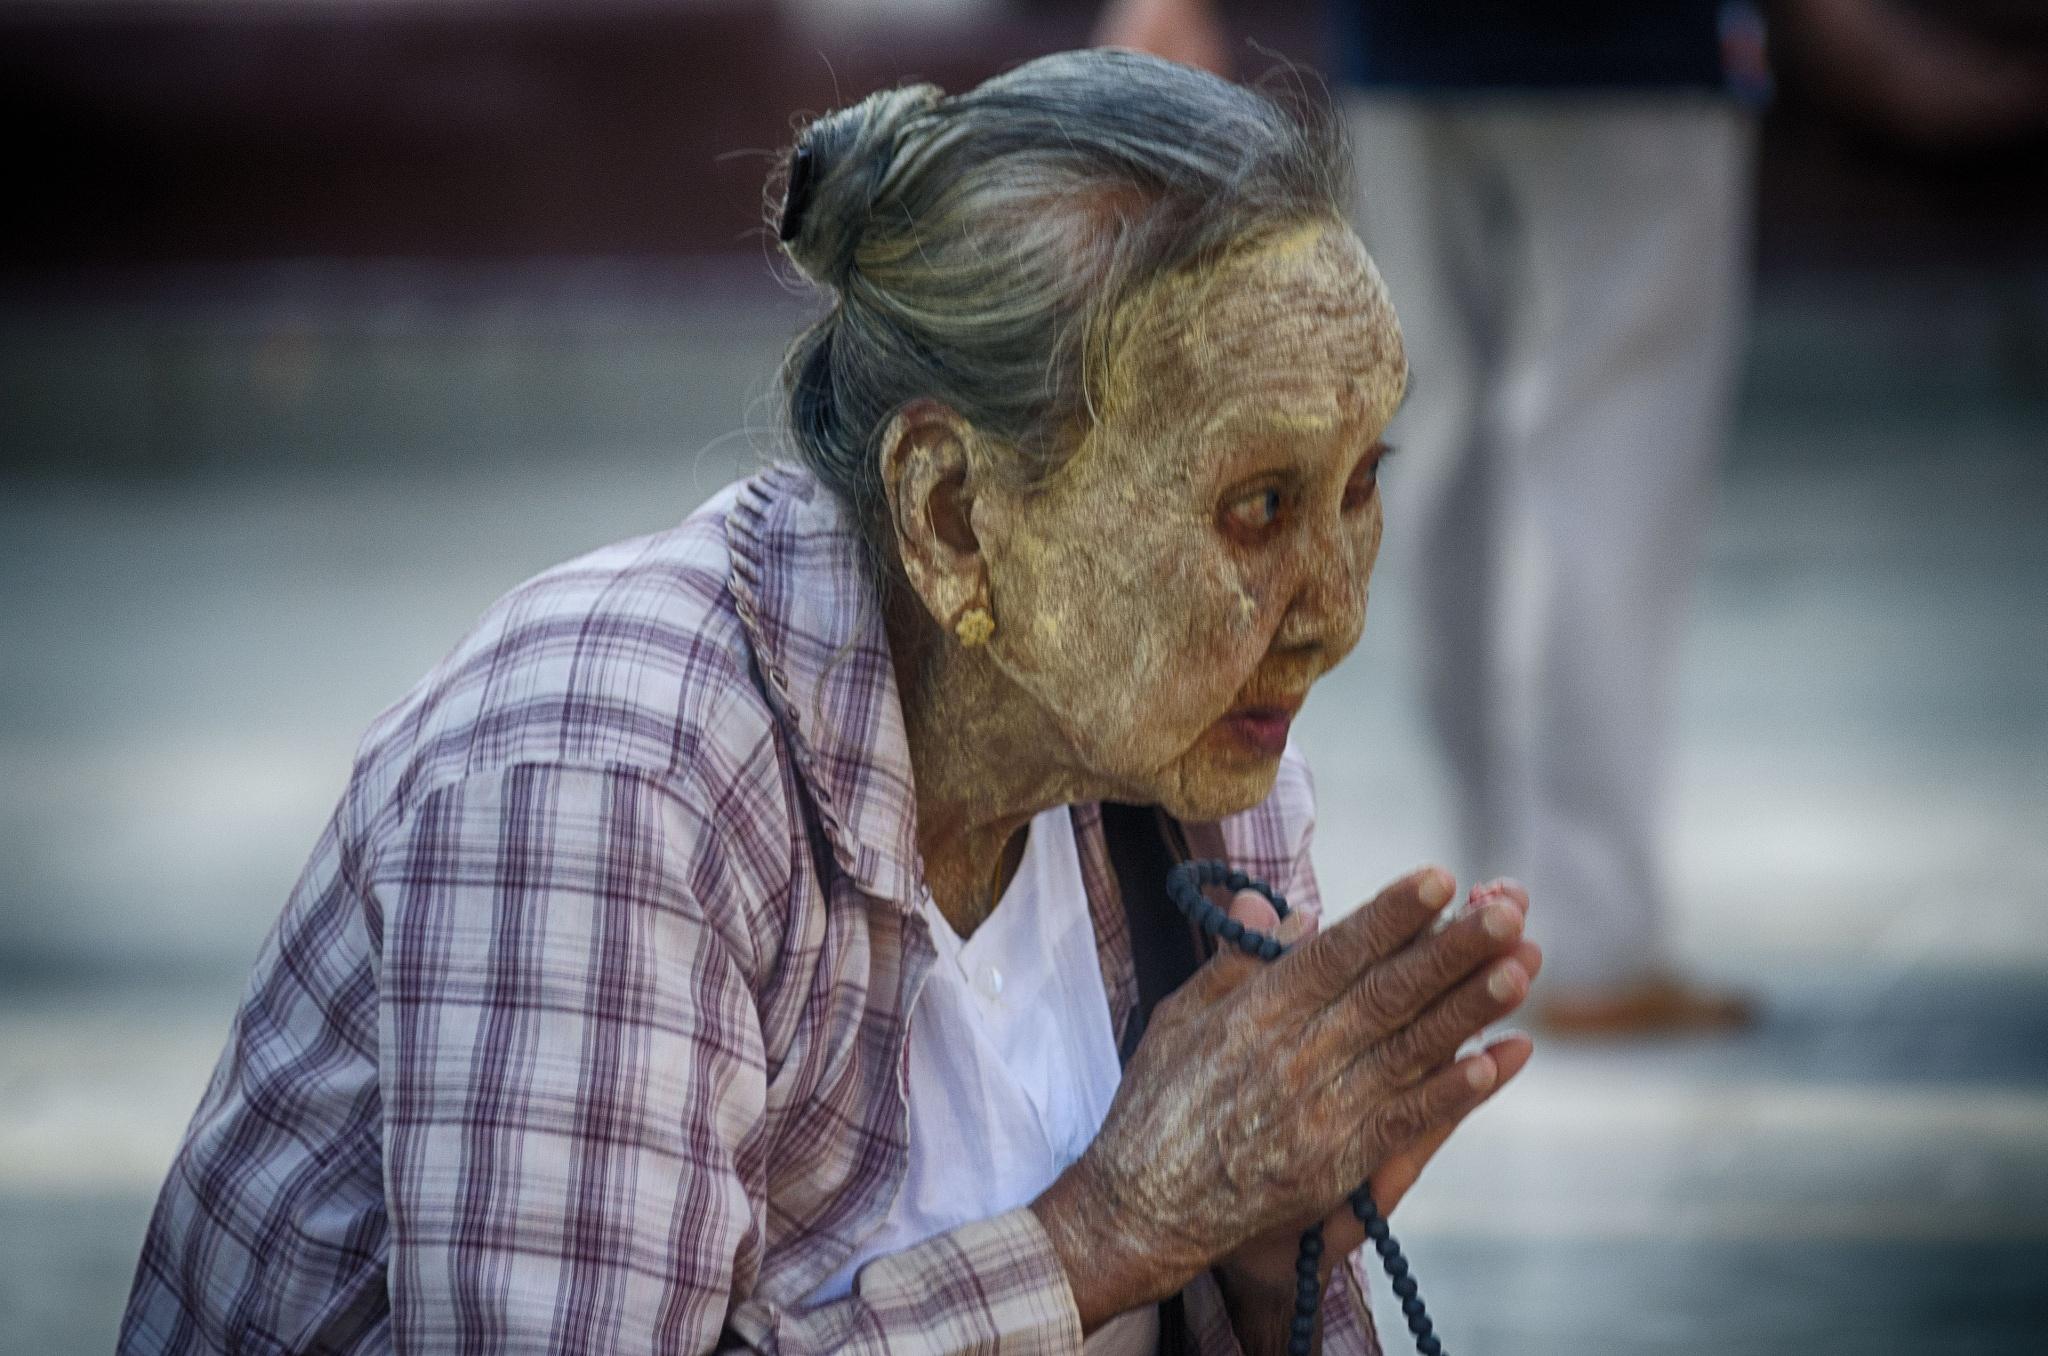 old woman praying at Shwenagon Pagoda, Yangon by jeece69